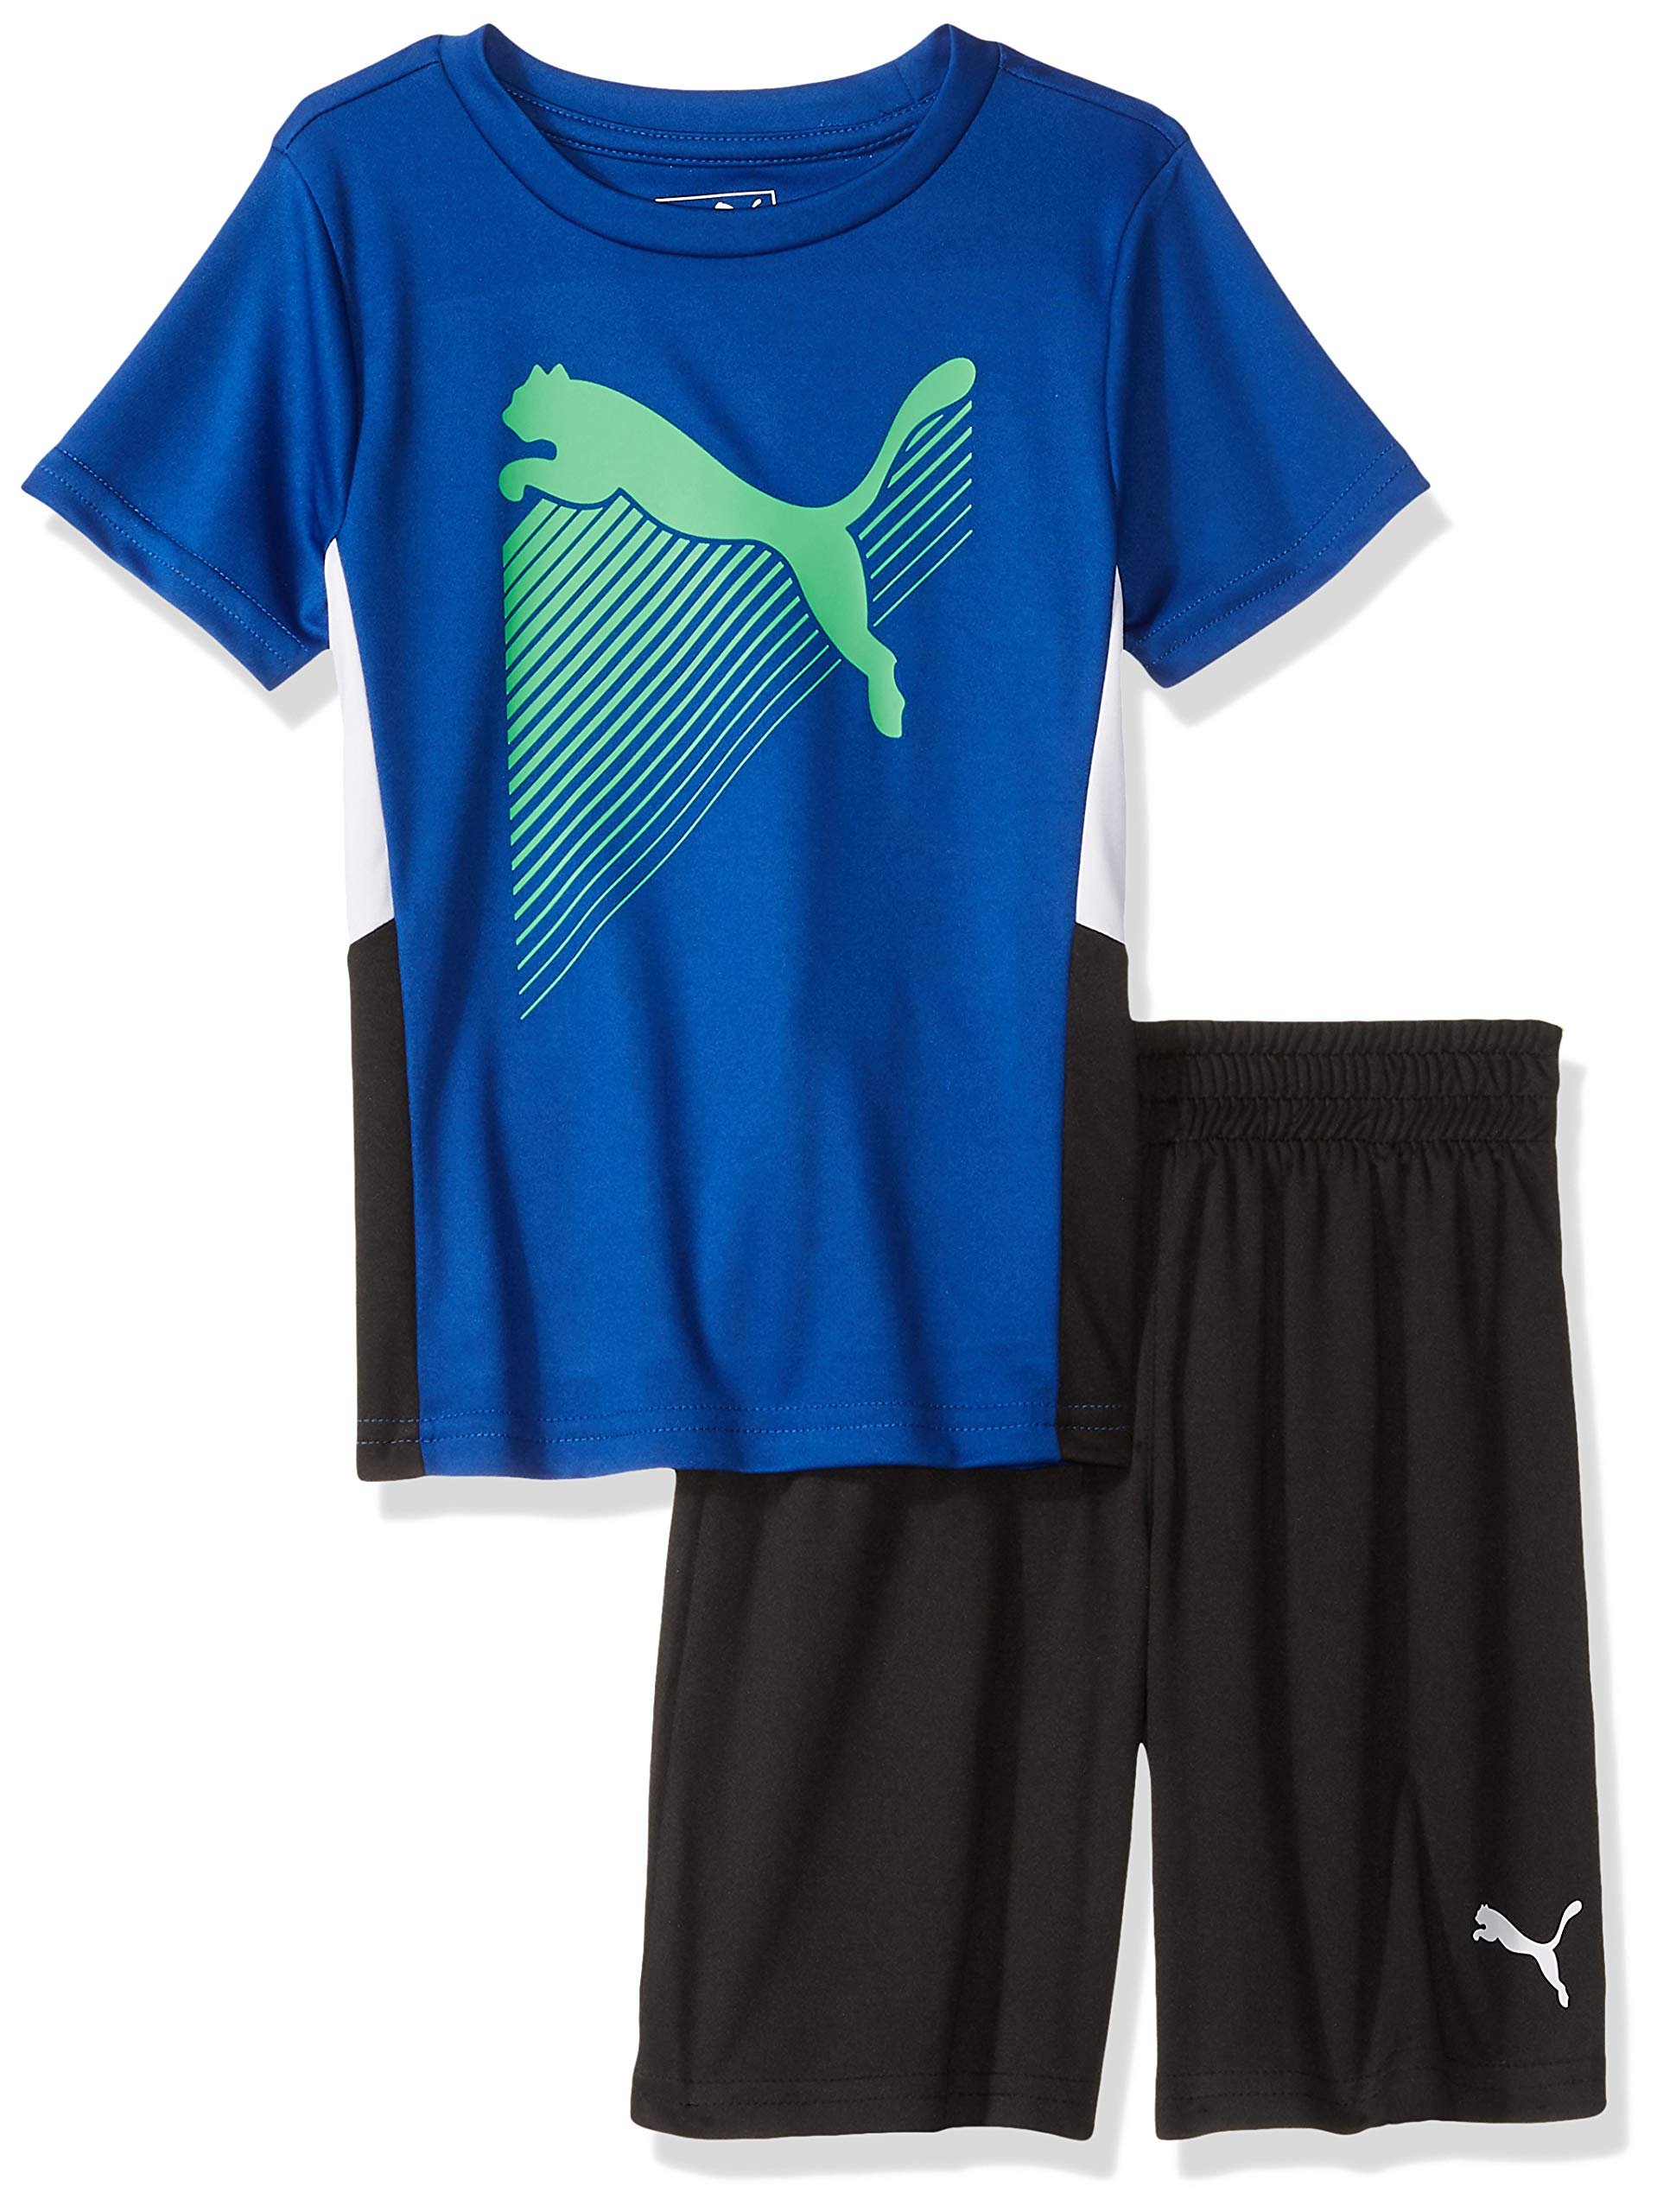 PUMA Little Boys' T-Shirt & Short Set, Surf The Web 7